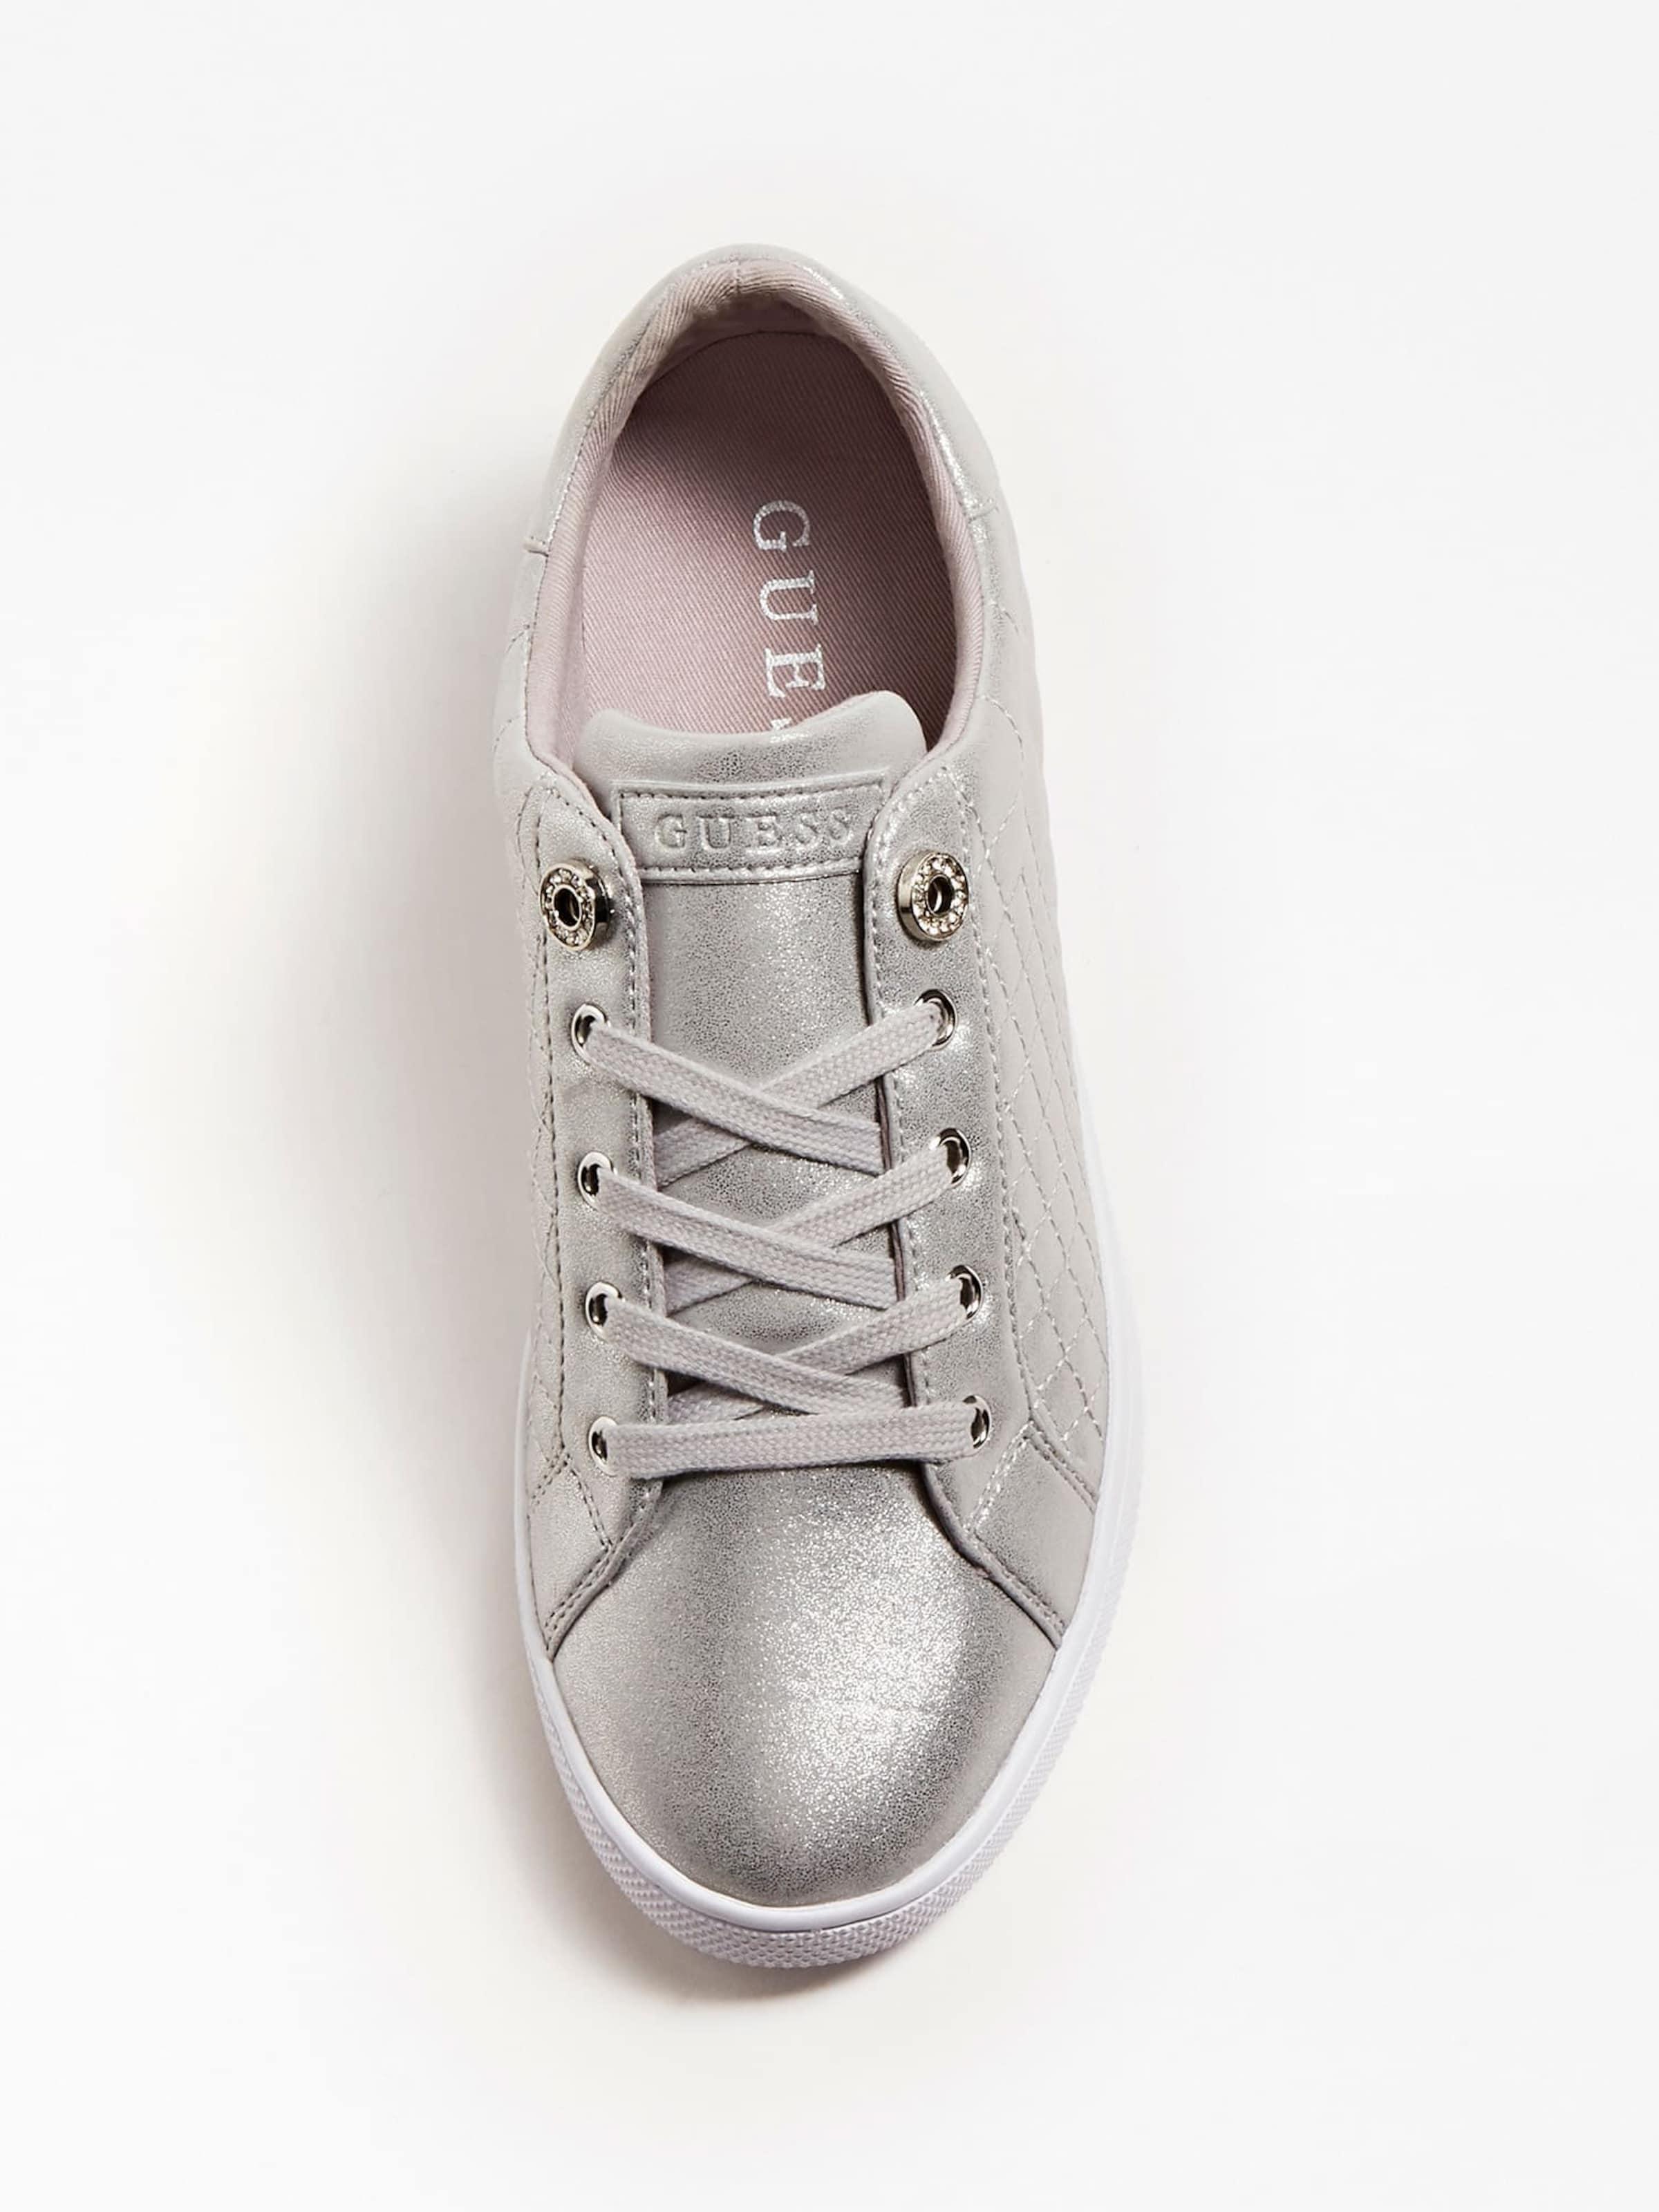 GUESS Sneaker in silber